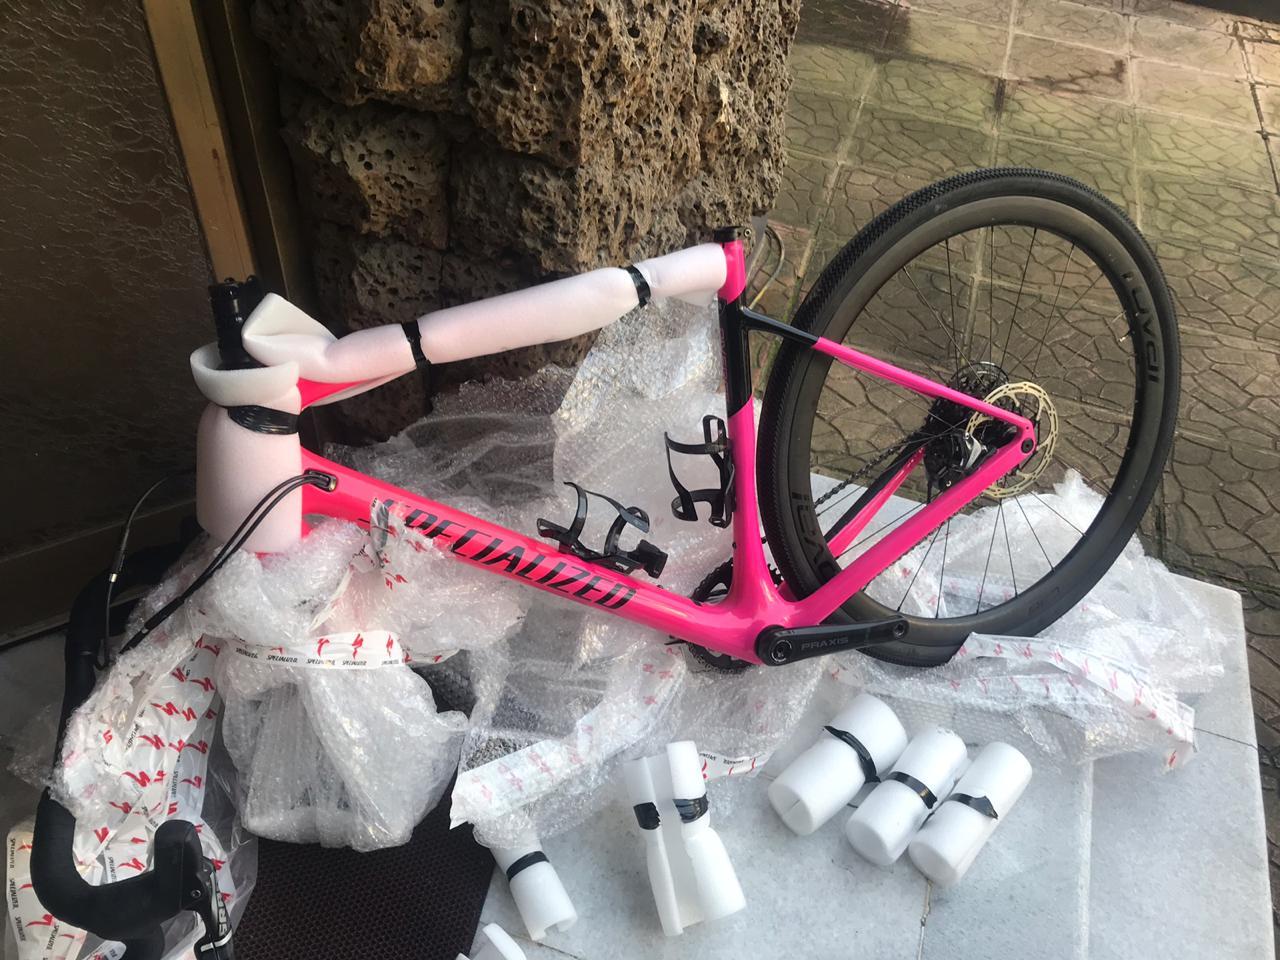 SURPRISE! It's a .... pink bike?